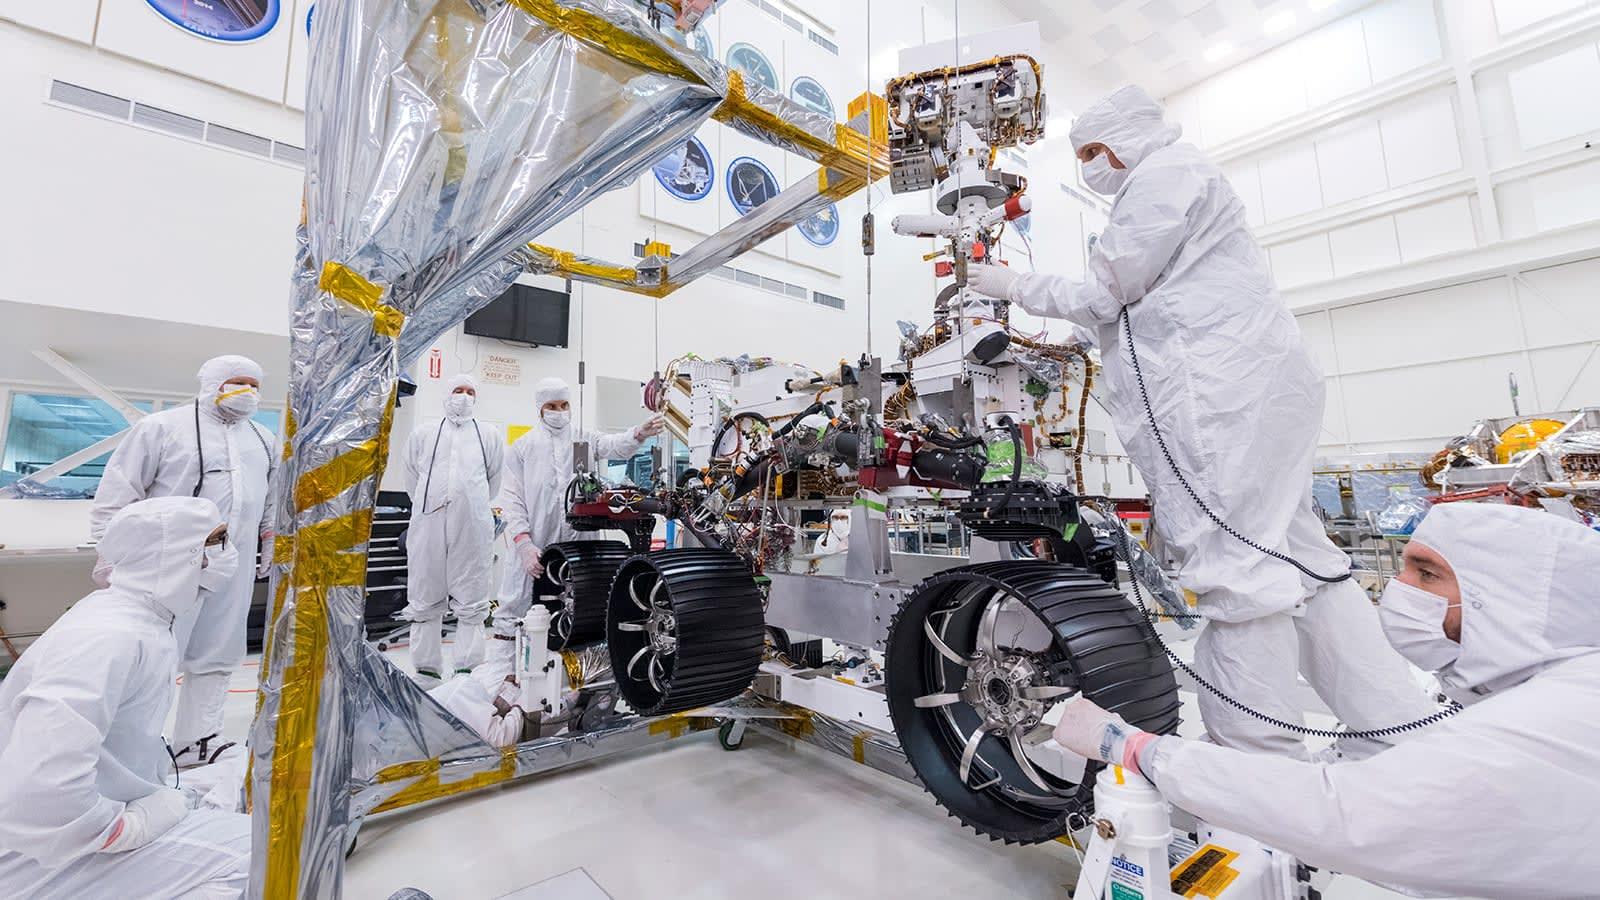 mars 2020 rover landing date - photo #12